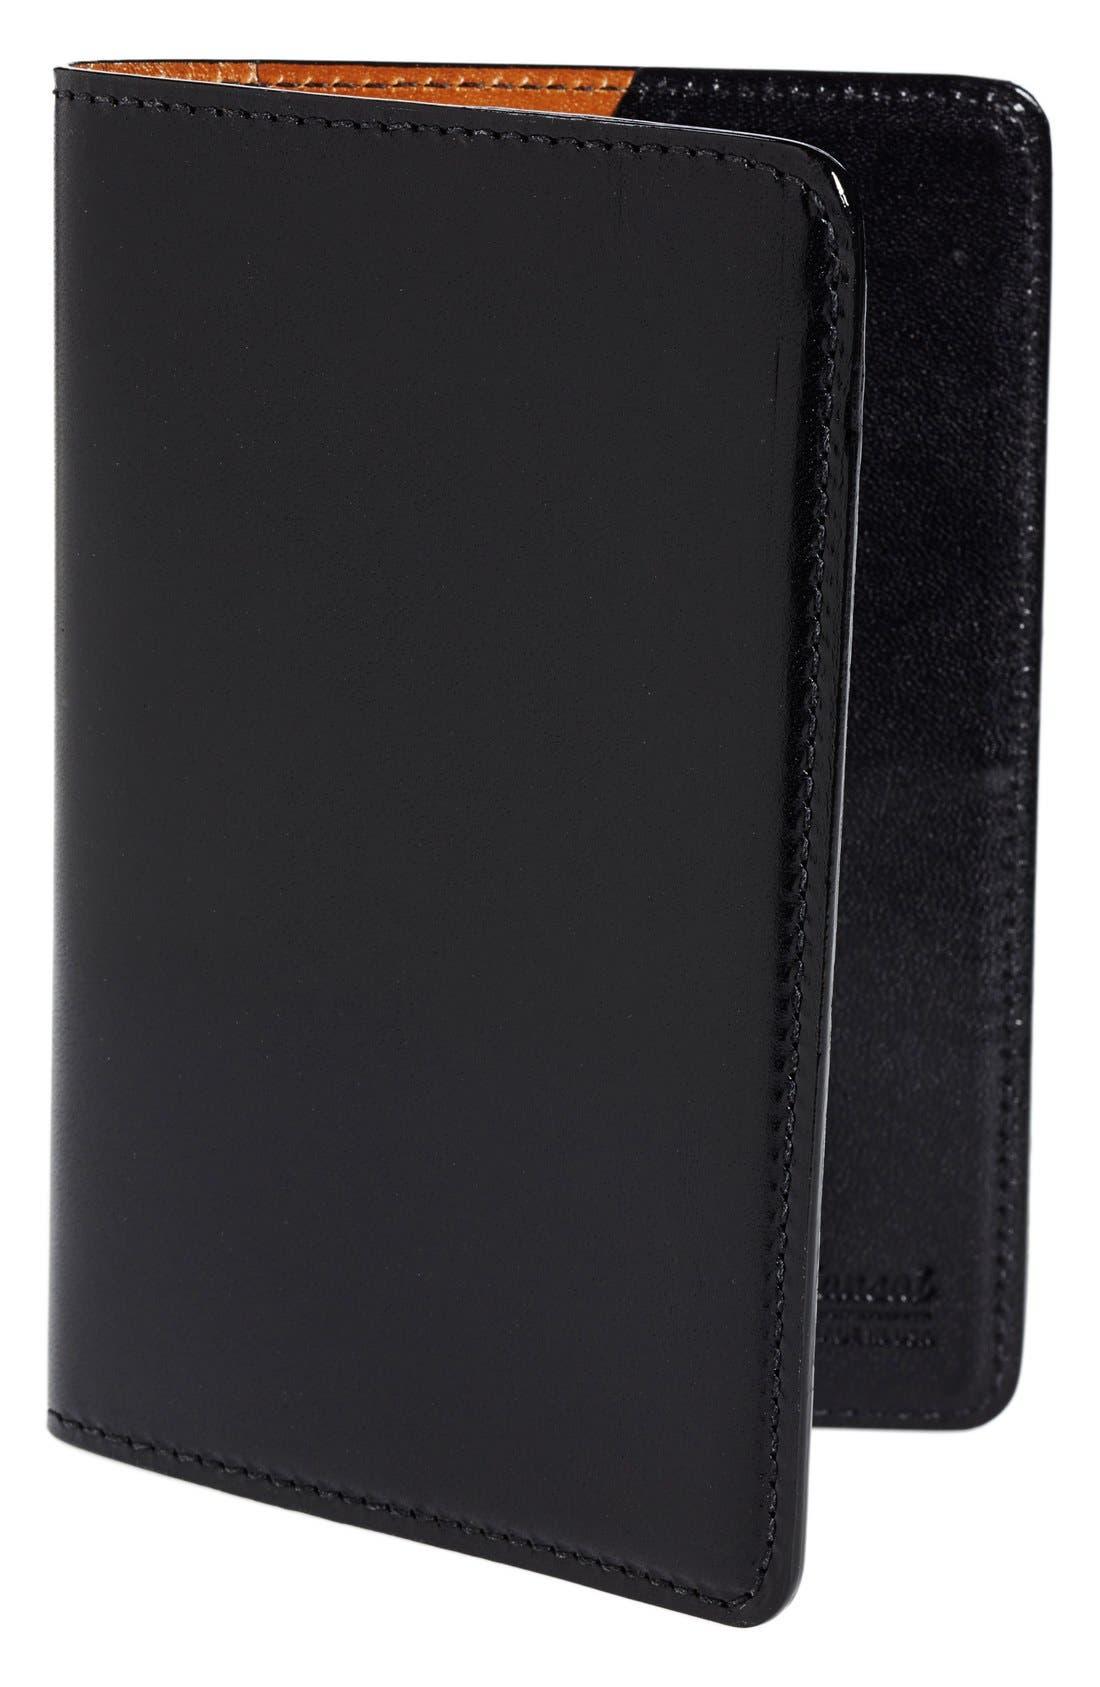 Miansai Leather Passport Wallet Nordstrom